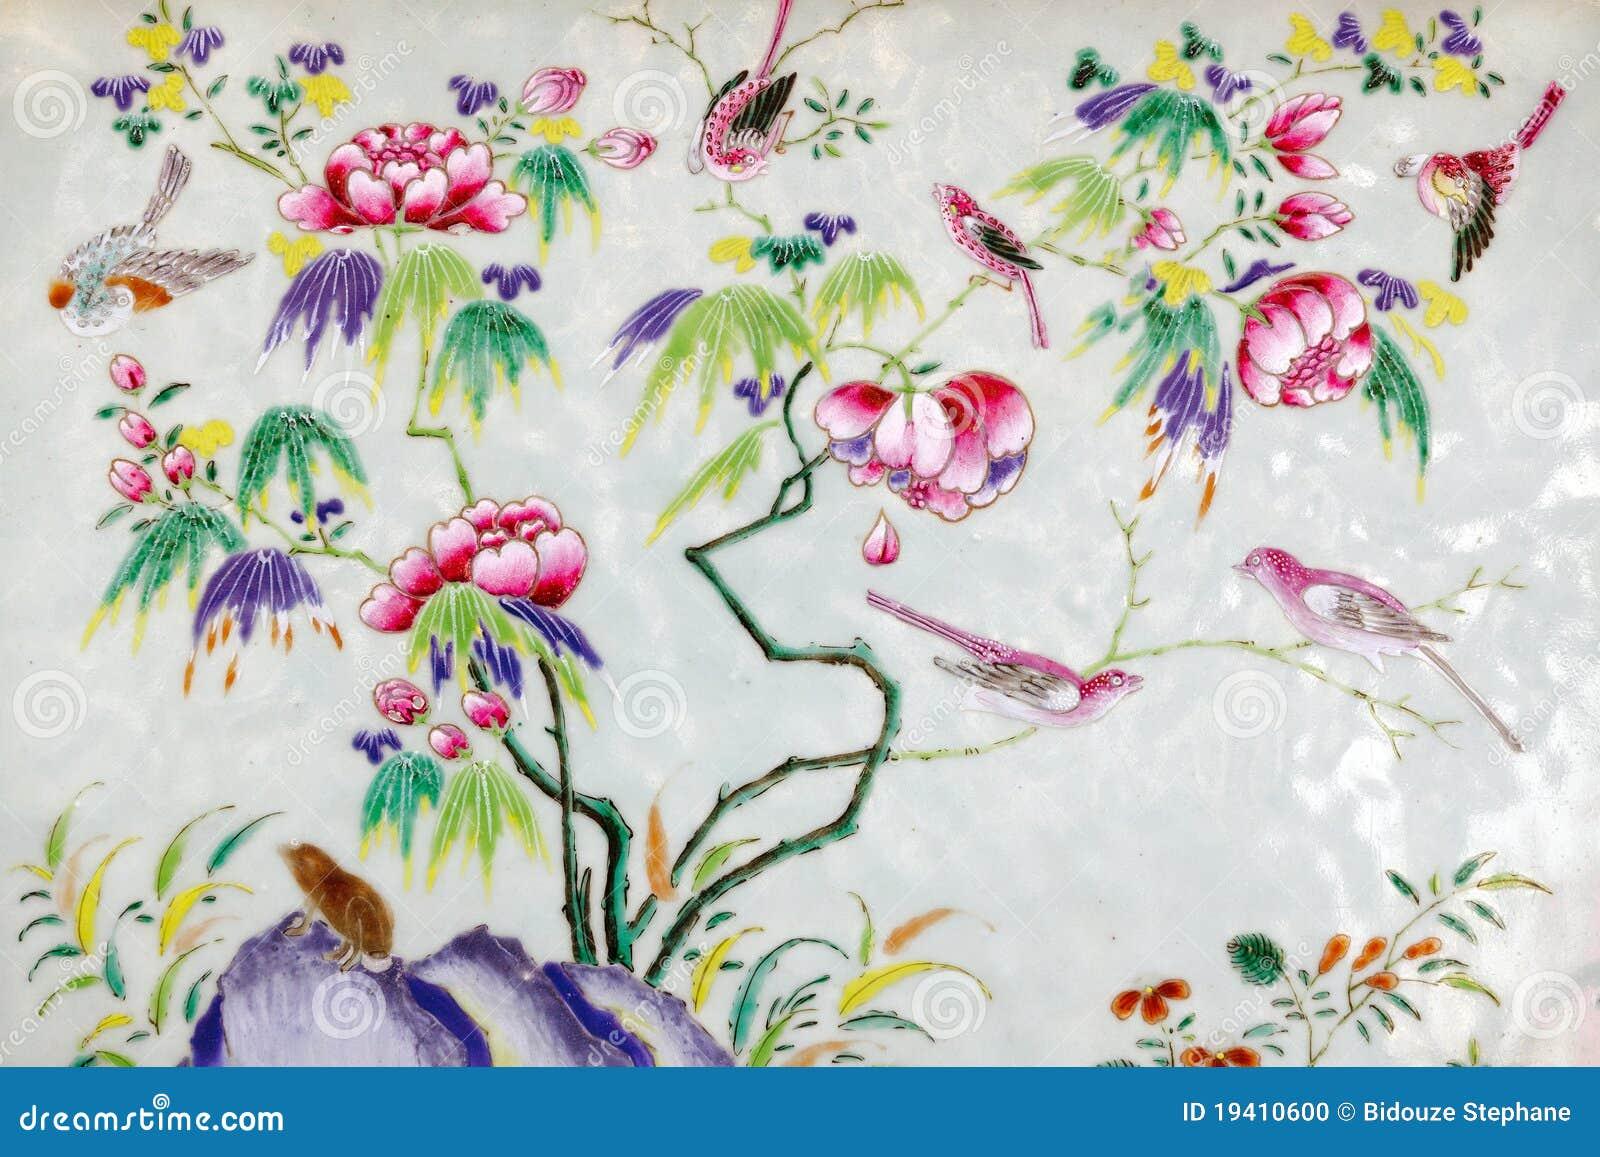 Pitture asiatiche